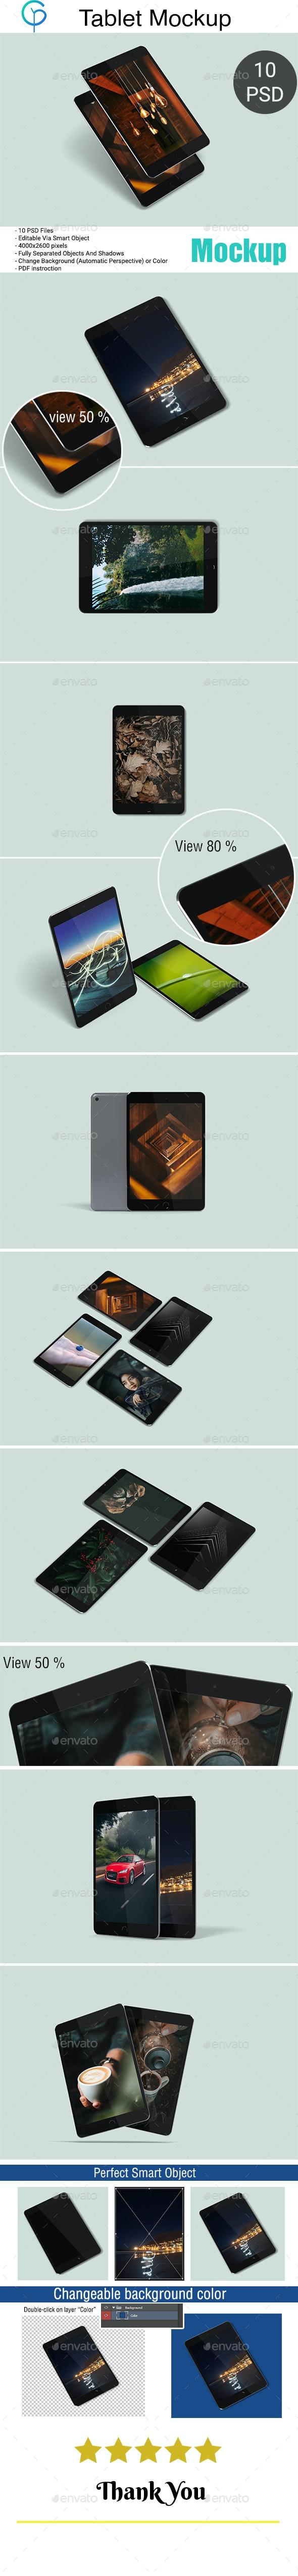 Tablet Mockup 3D - Displays Product Mock-Ups